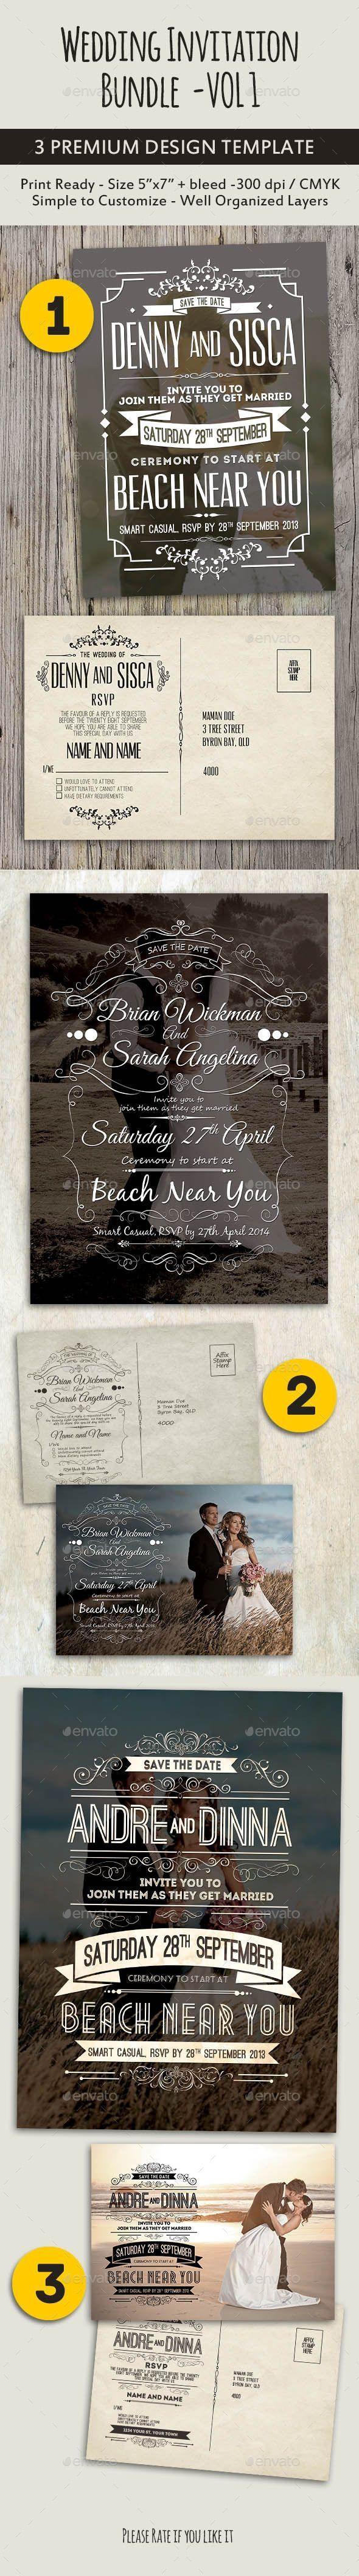 Wedding Invitation Template u0026 Design Invitation WeddingCard